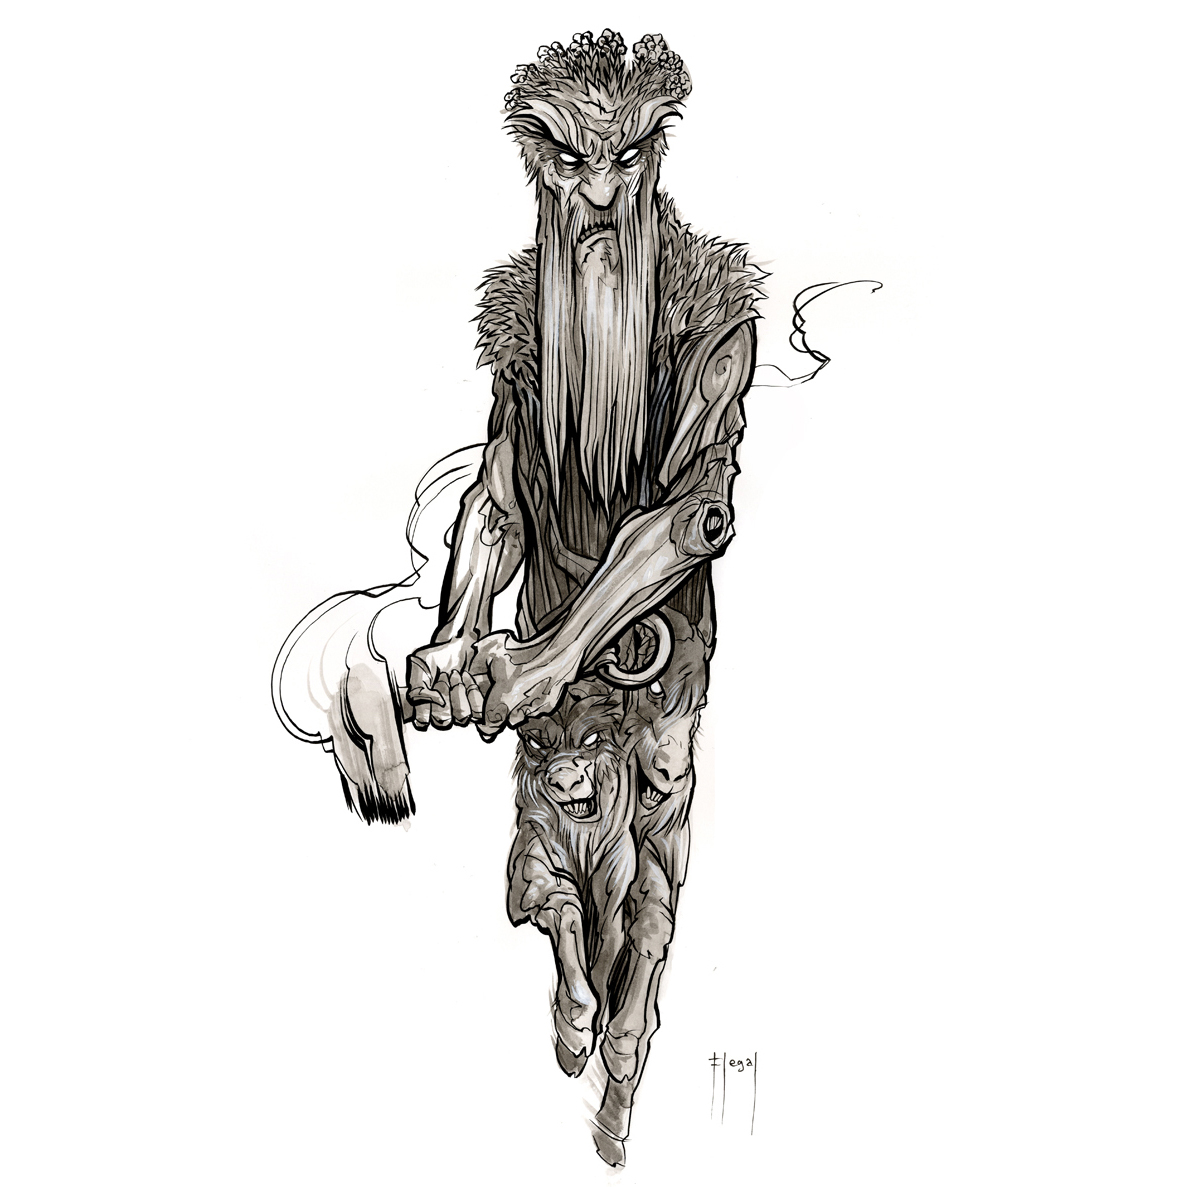 voluspa_Norse_Mythology_Book_verse26.jpg